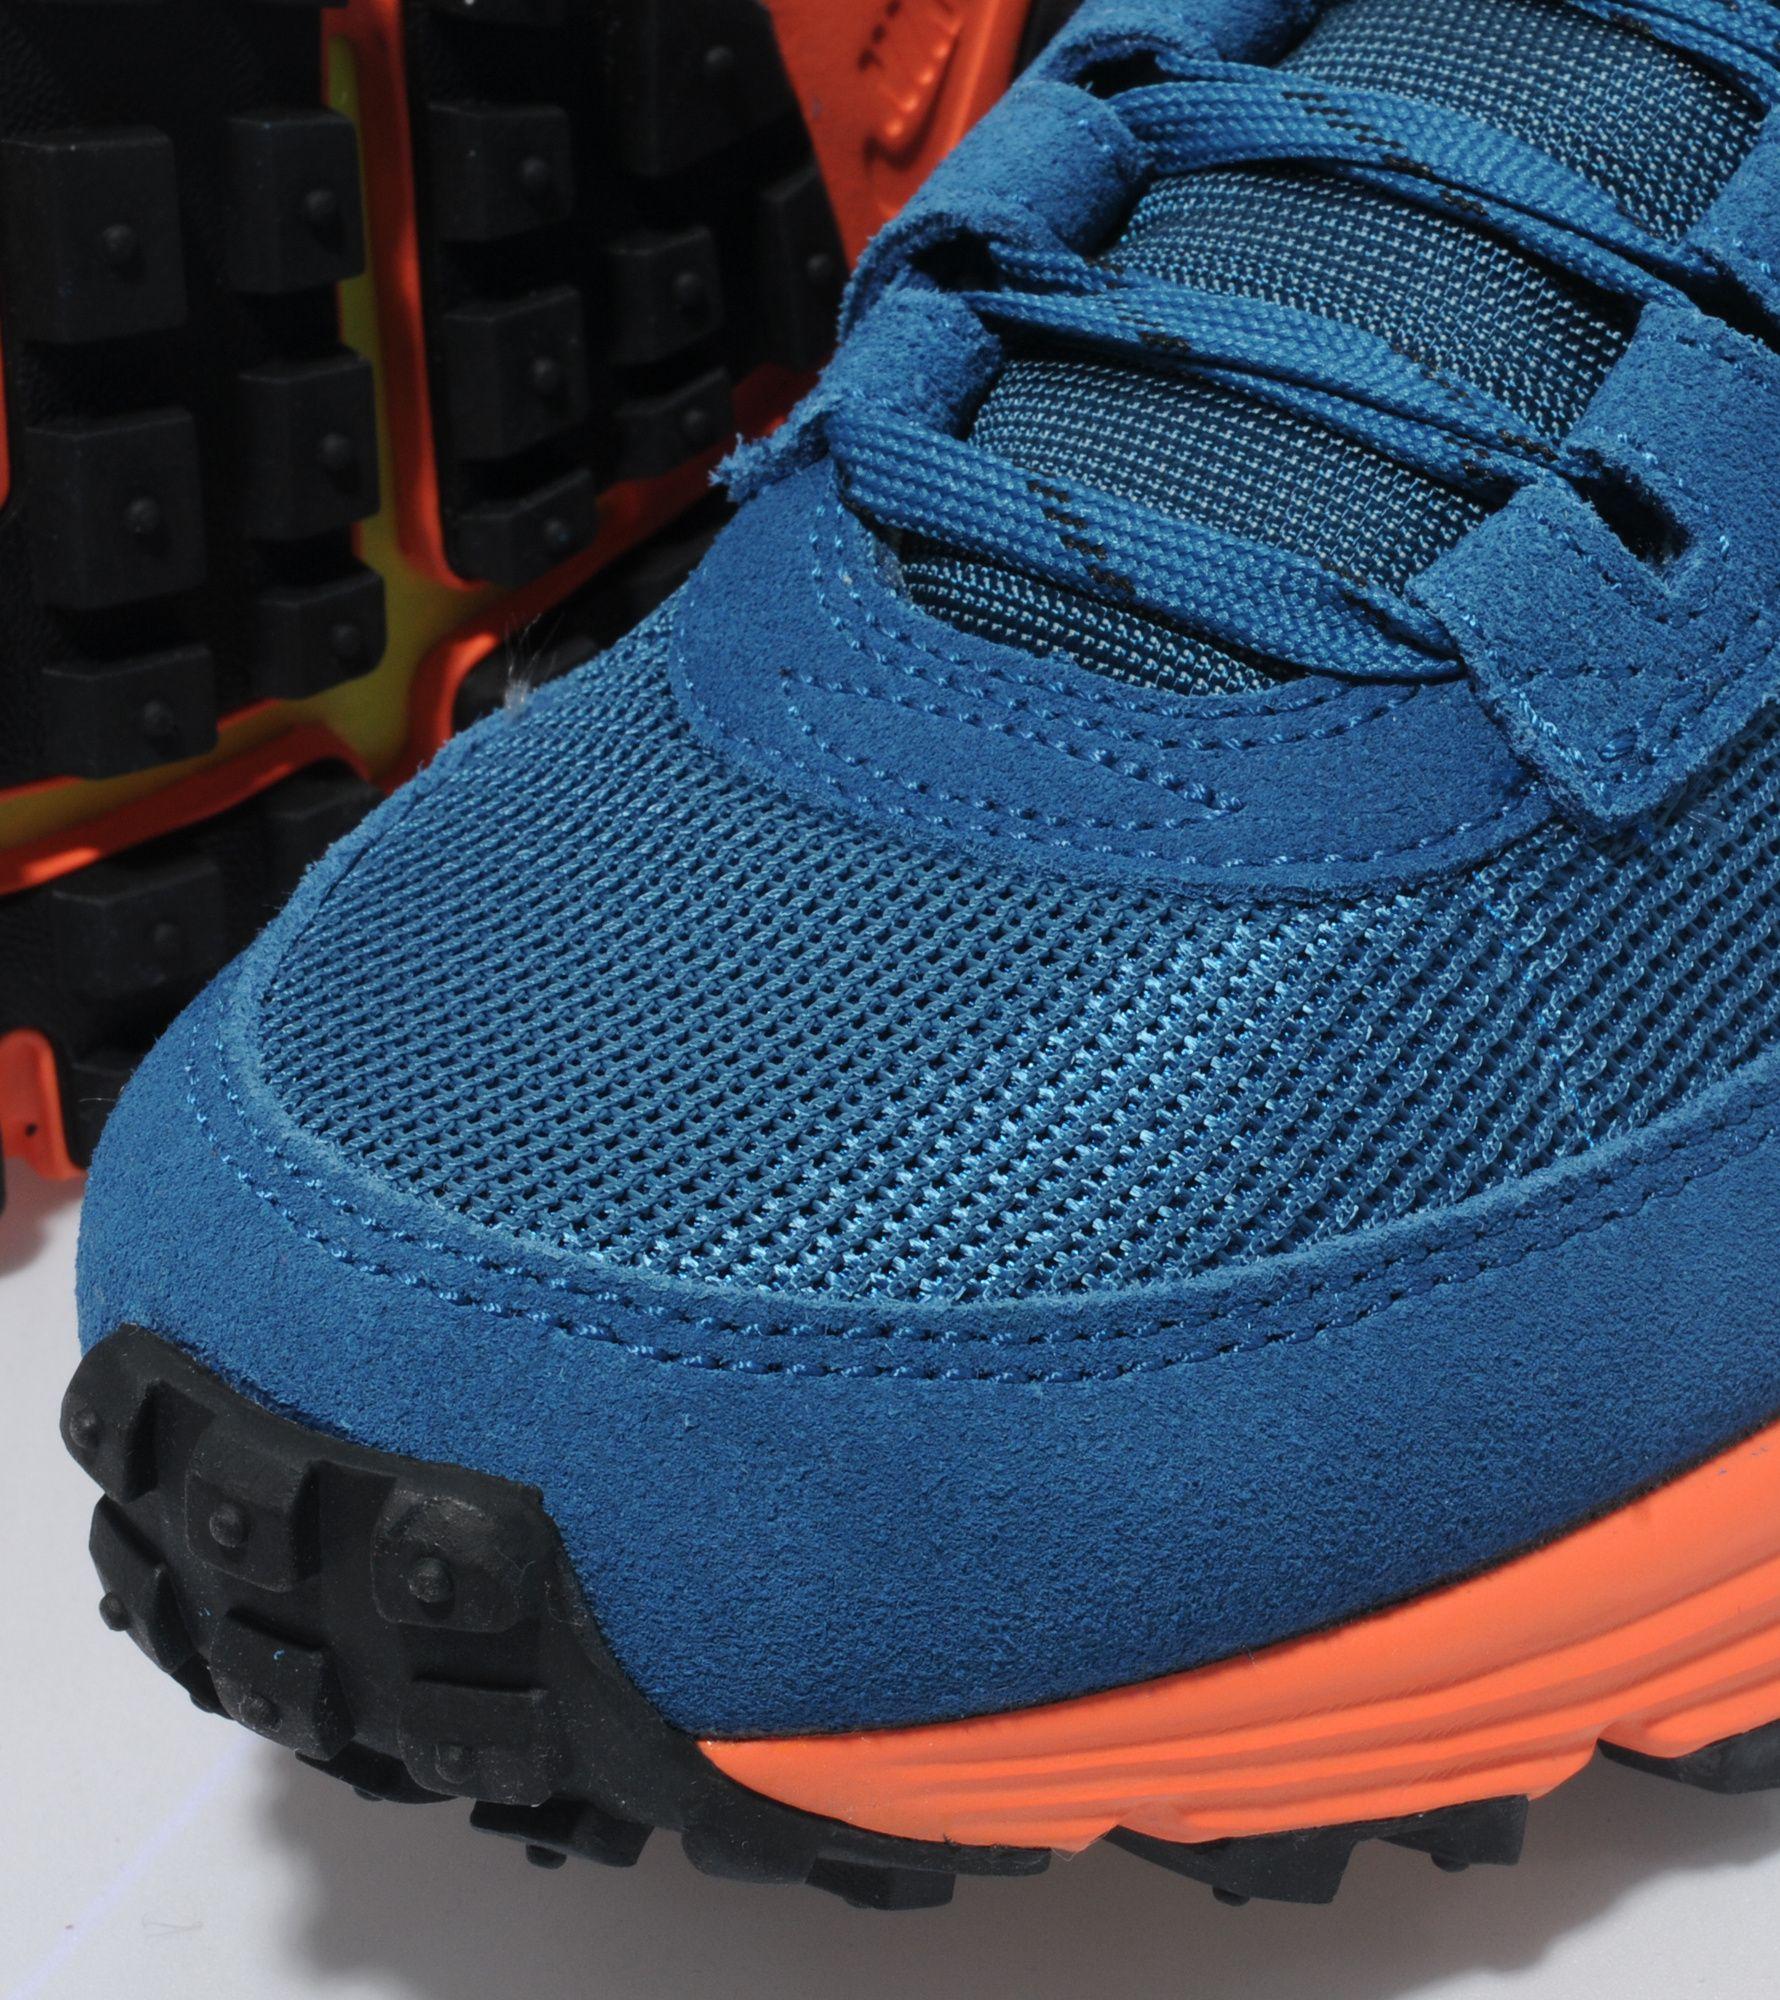 Nike Lunar LDV QS